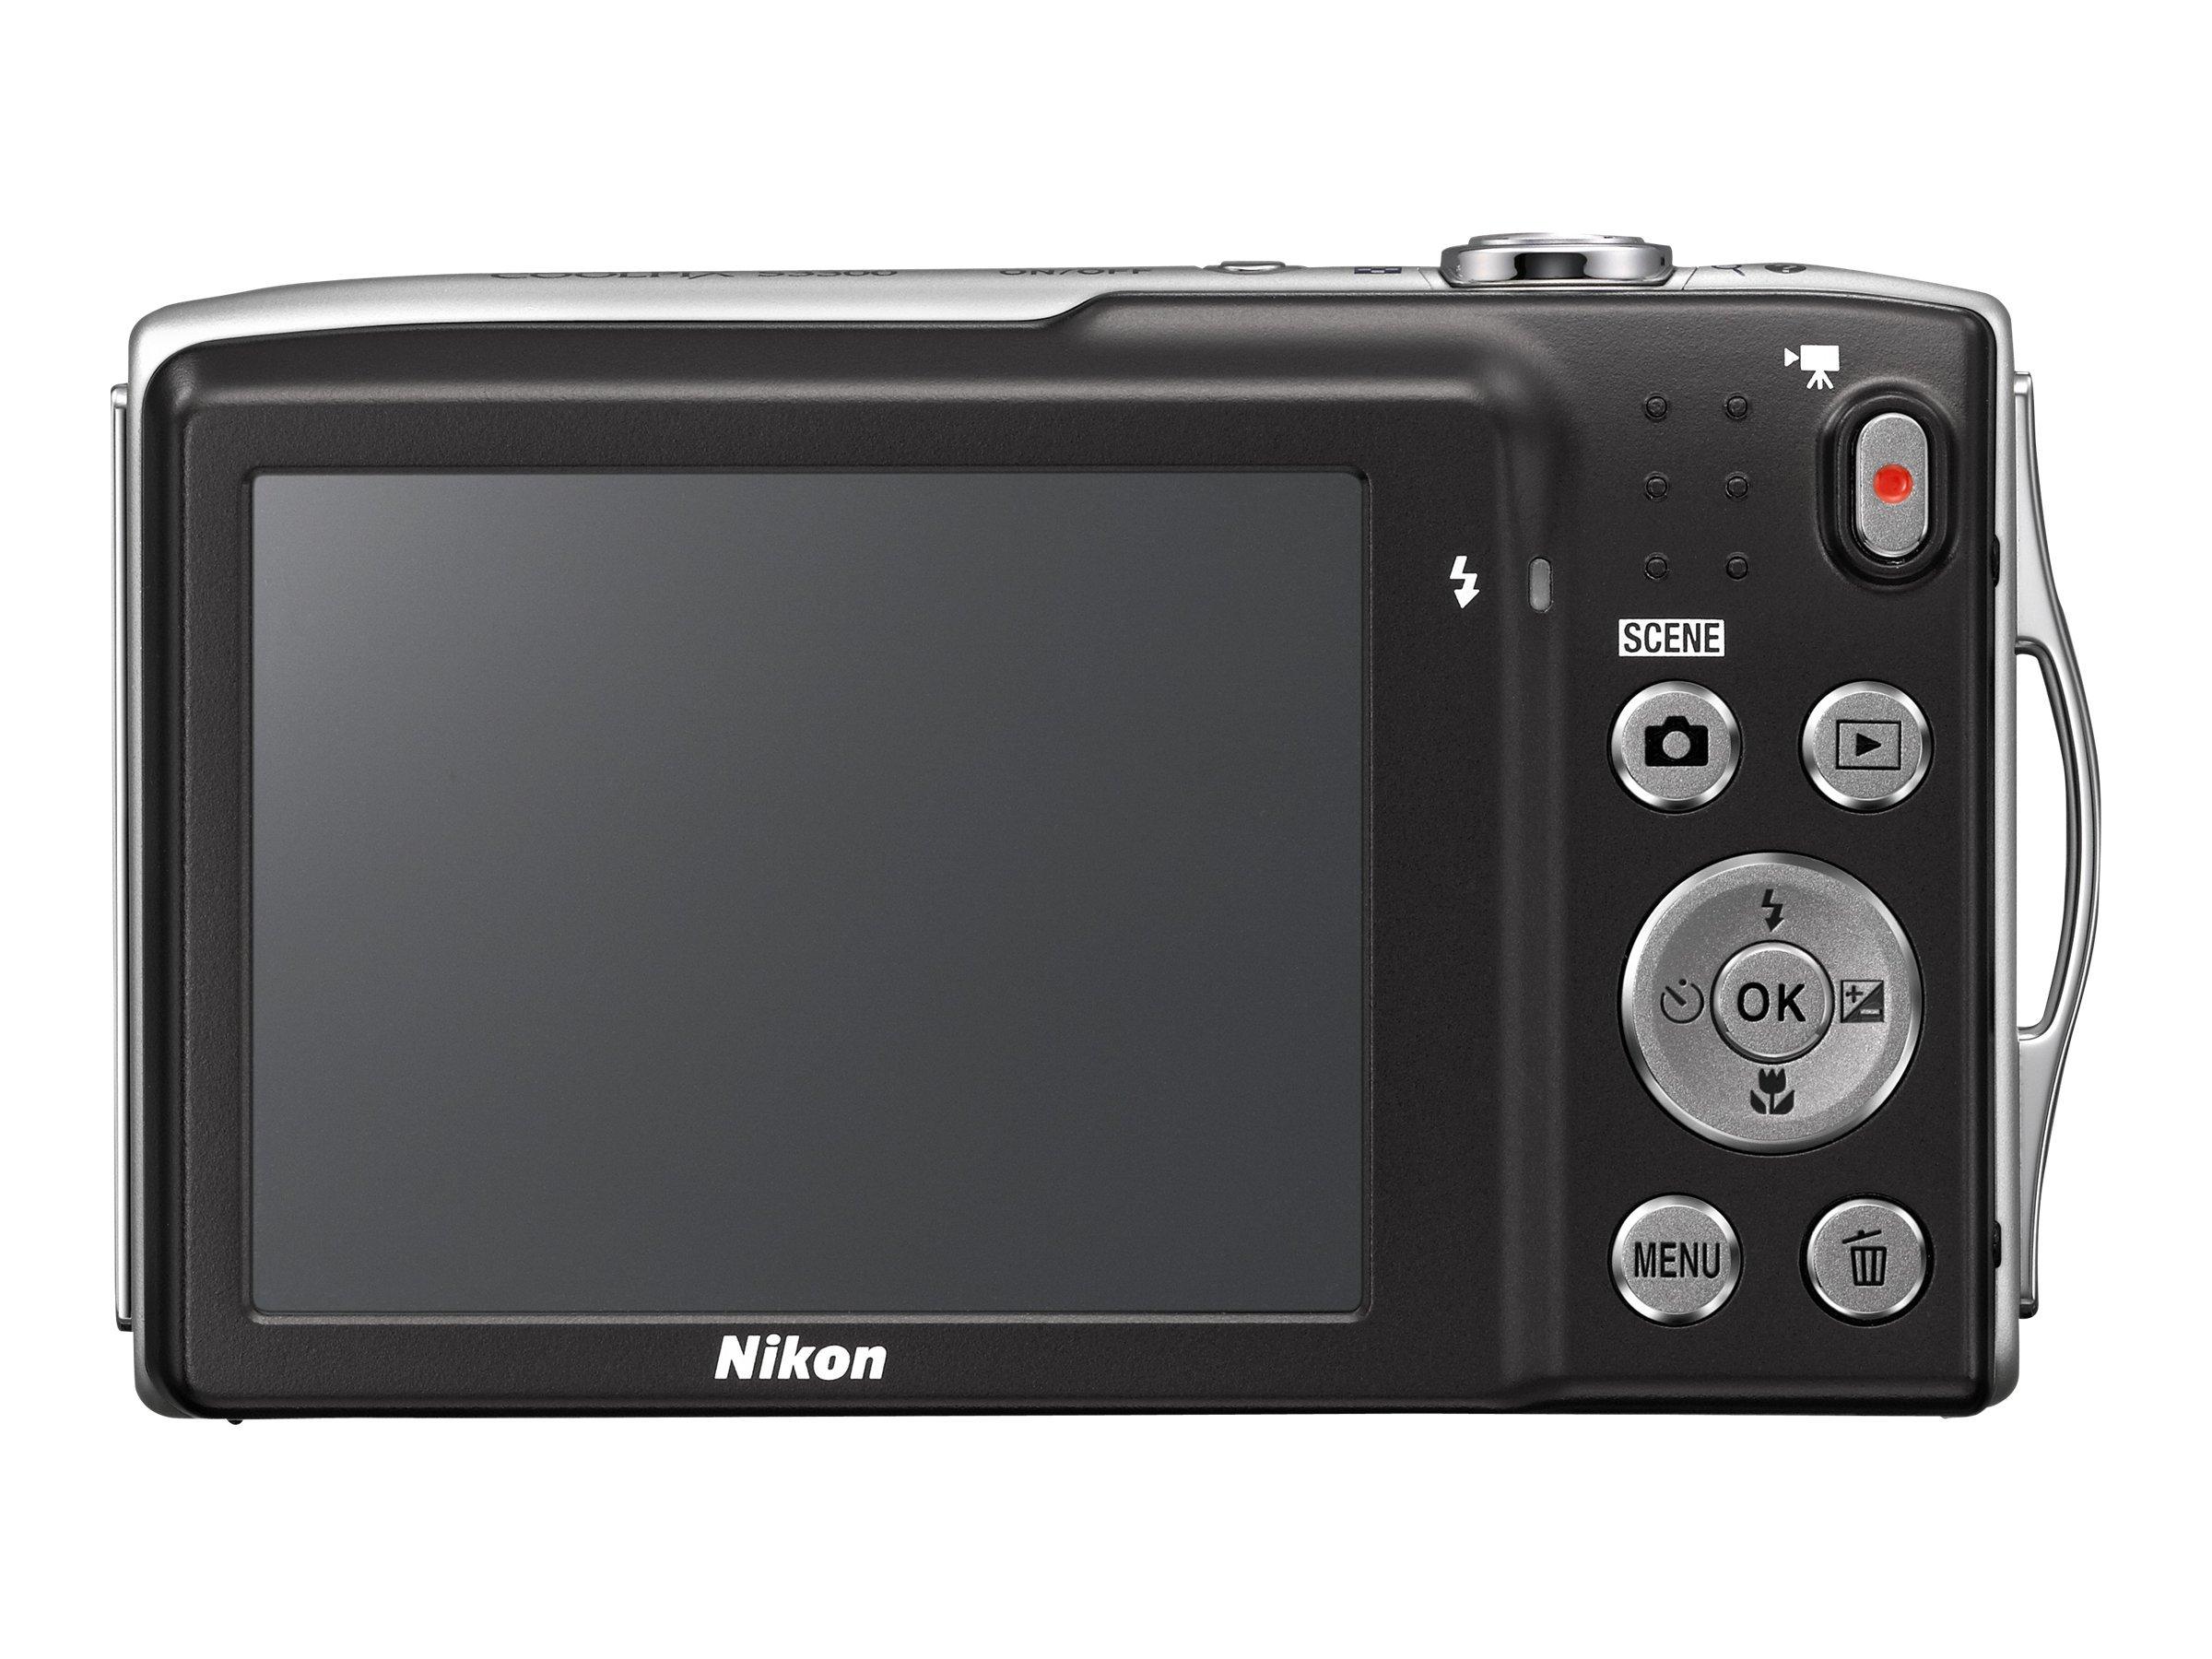 Nikon COOLPIX S3300 Digital Camera 16MP - Silver